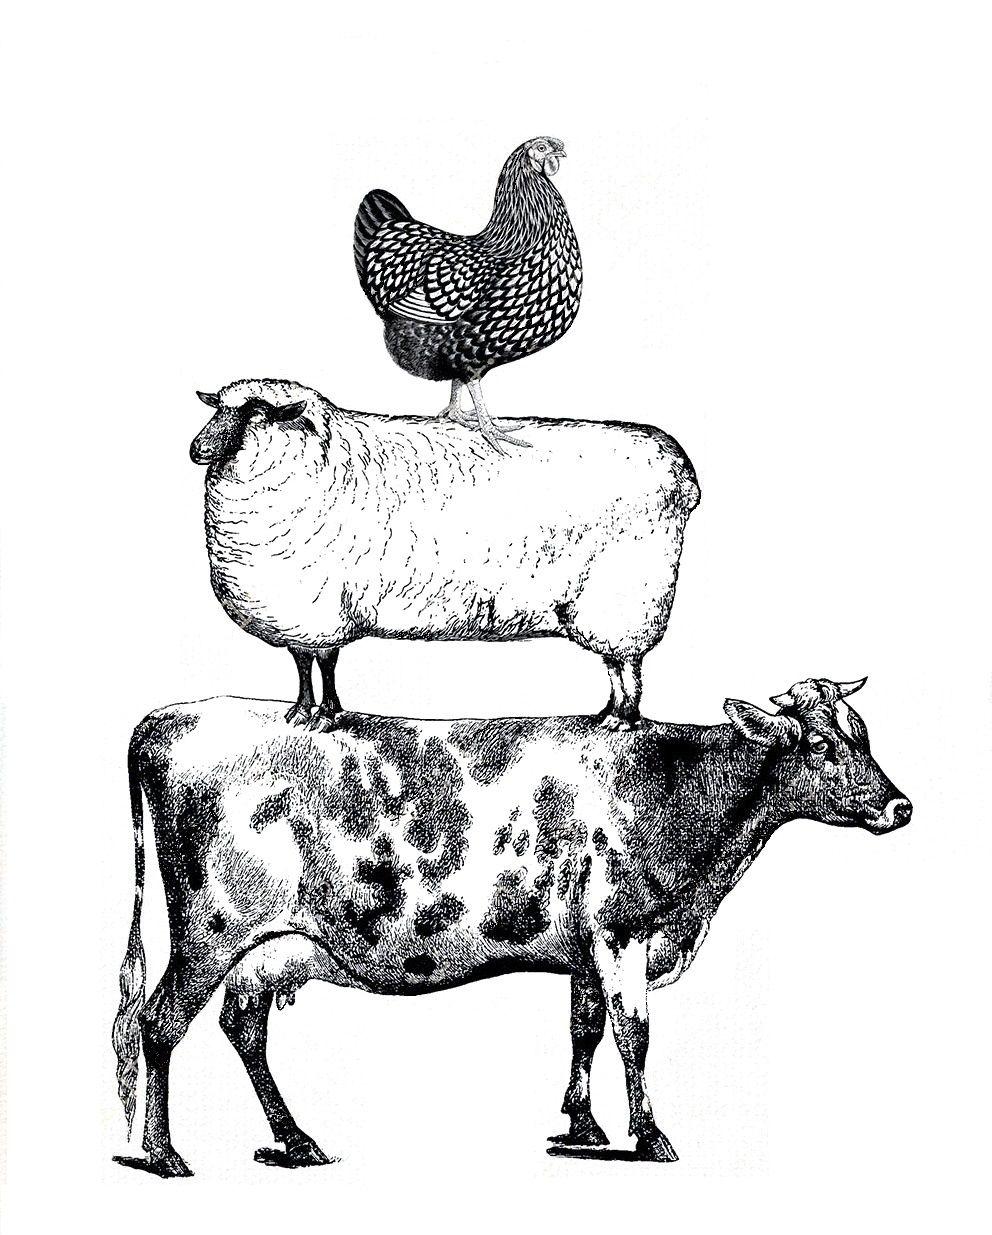 Pin By Pamela Goni On Cinnamoncreek By Druann Jefferies Favorites Art Farm Animals Animals